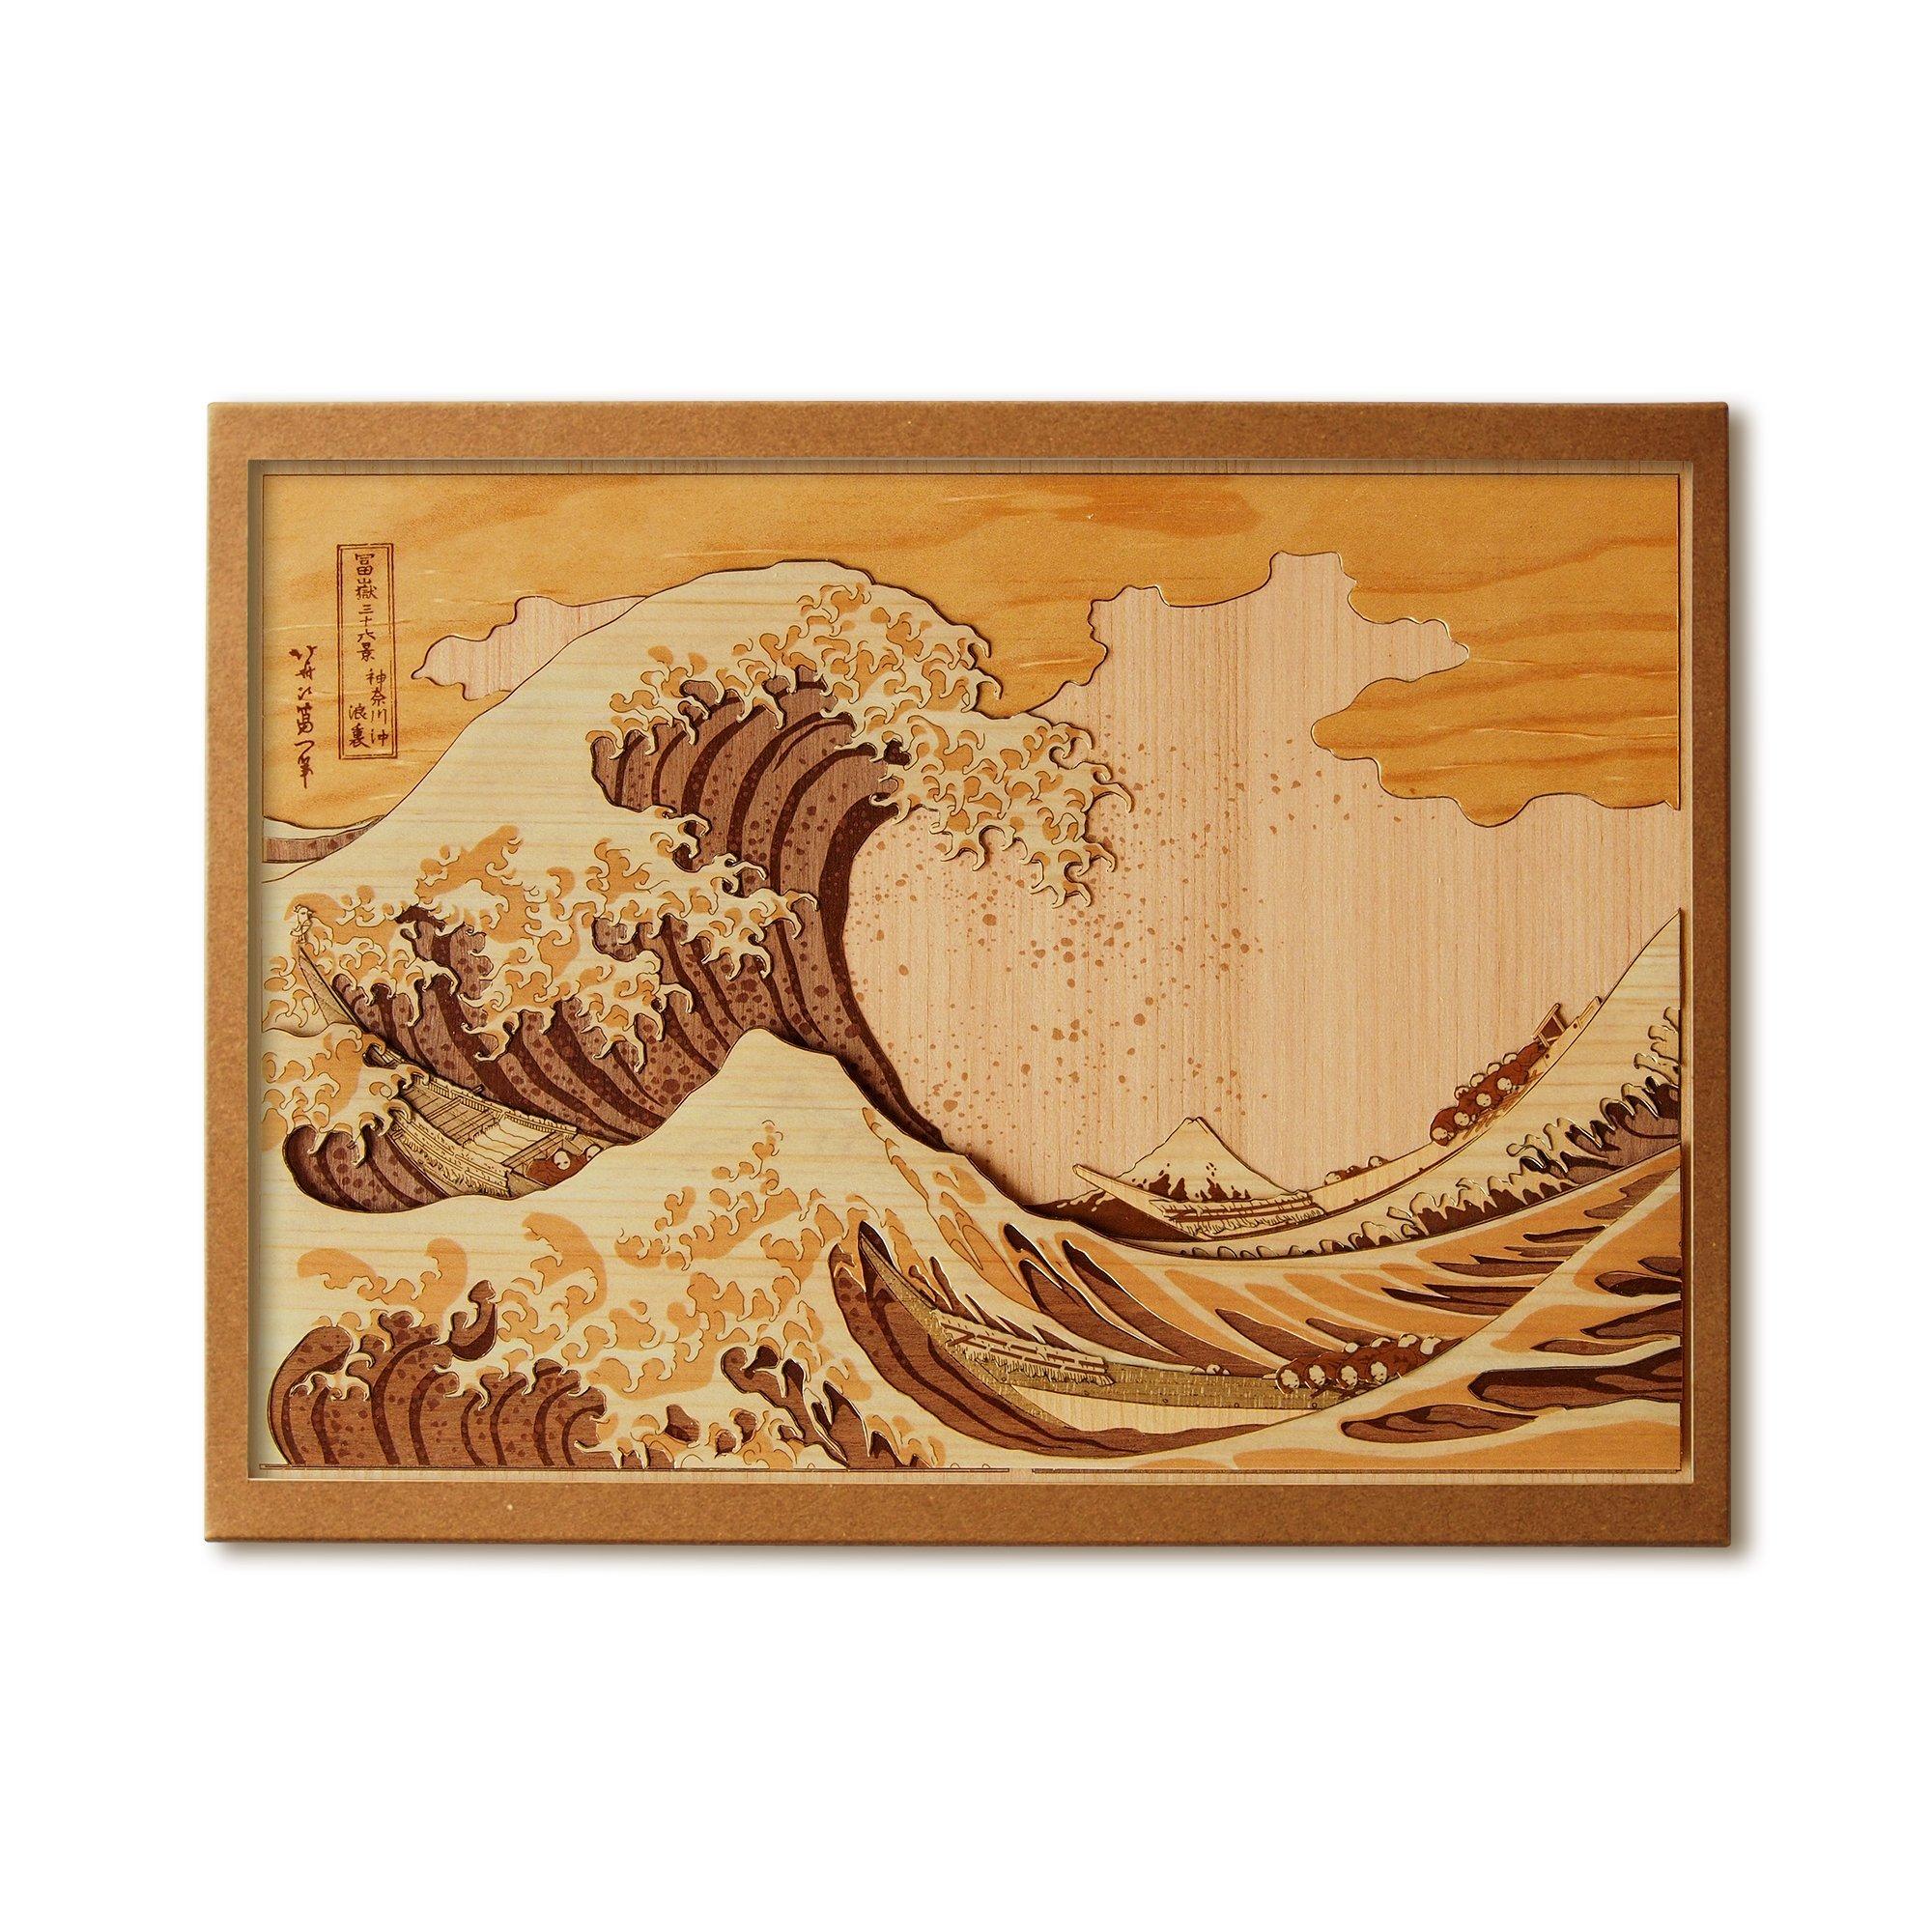 KINOWA Ukiyoe Art Kit Kiharie The Great Wave Off Kanagawa Thirty-six Views of Mount Fuji by Hokusai Made in Japan